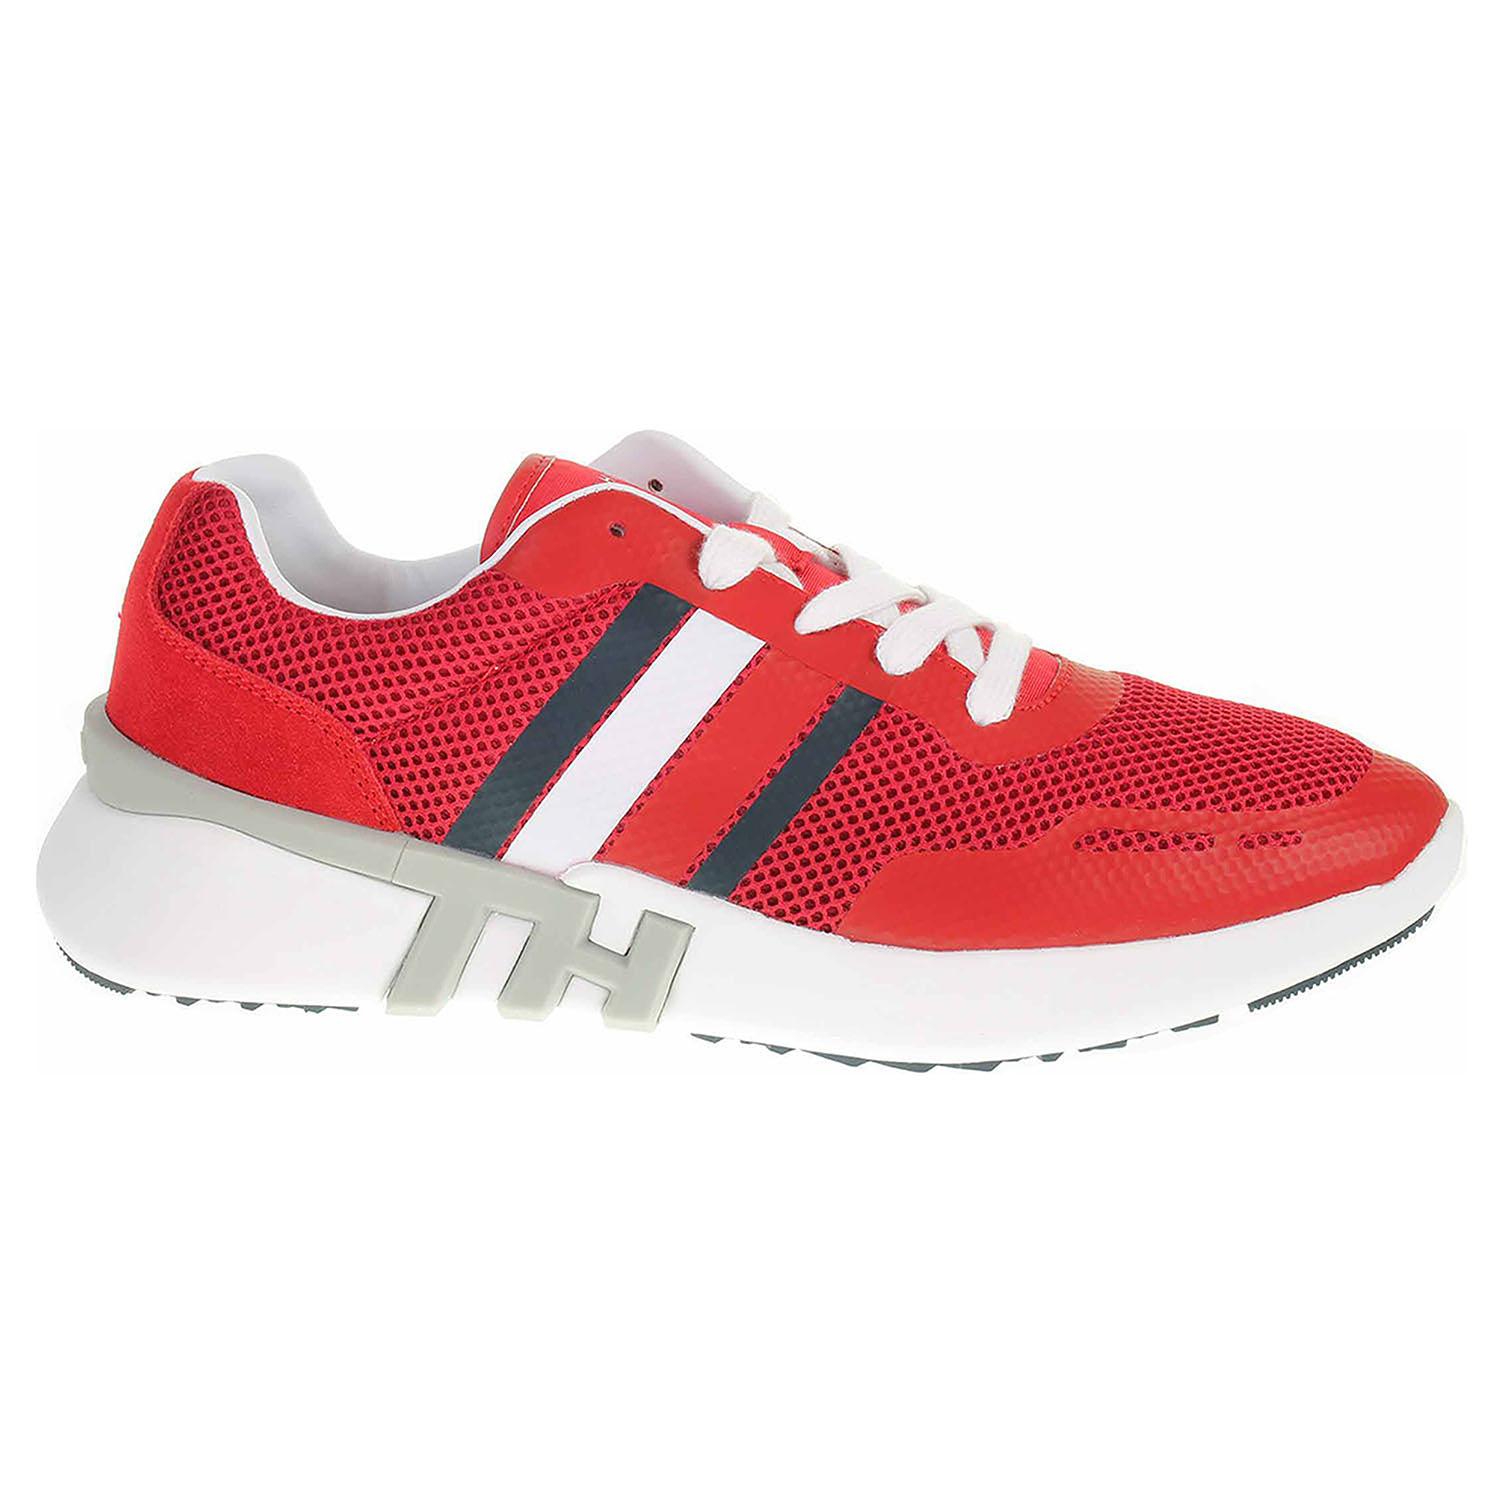 Pánská obuv Tommy Hilfiger FM0FM02661 XCN tango red FM0FM02661 XCN 42